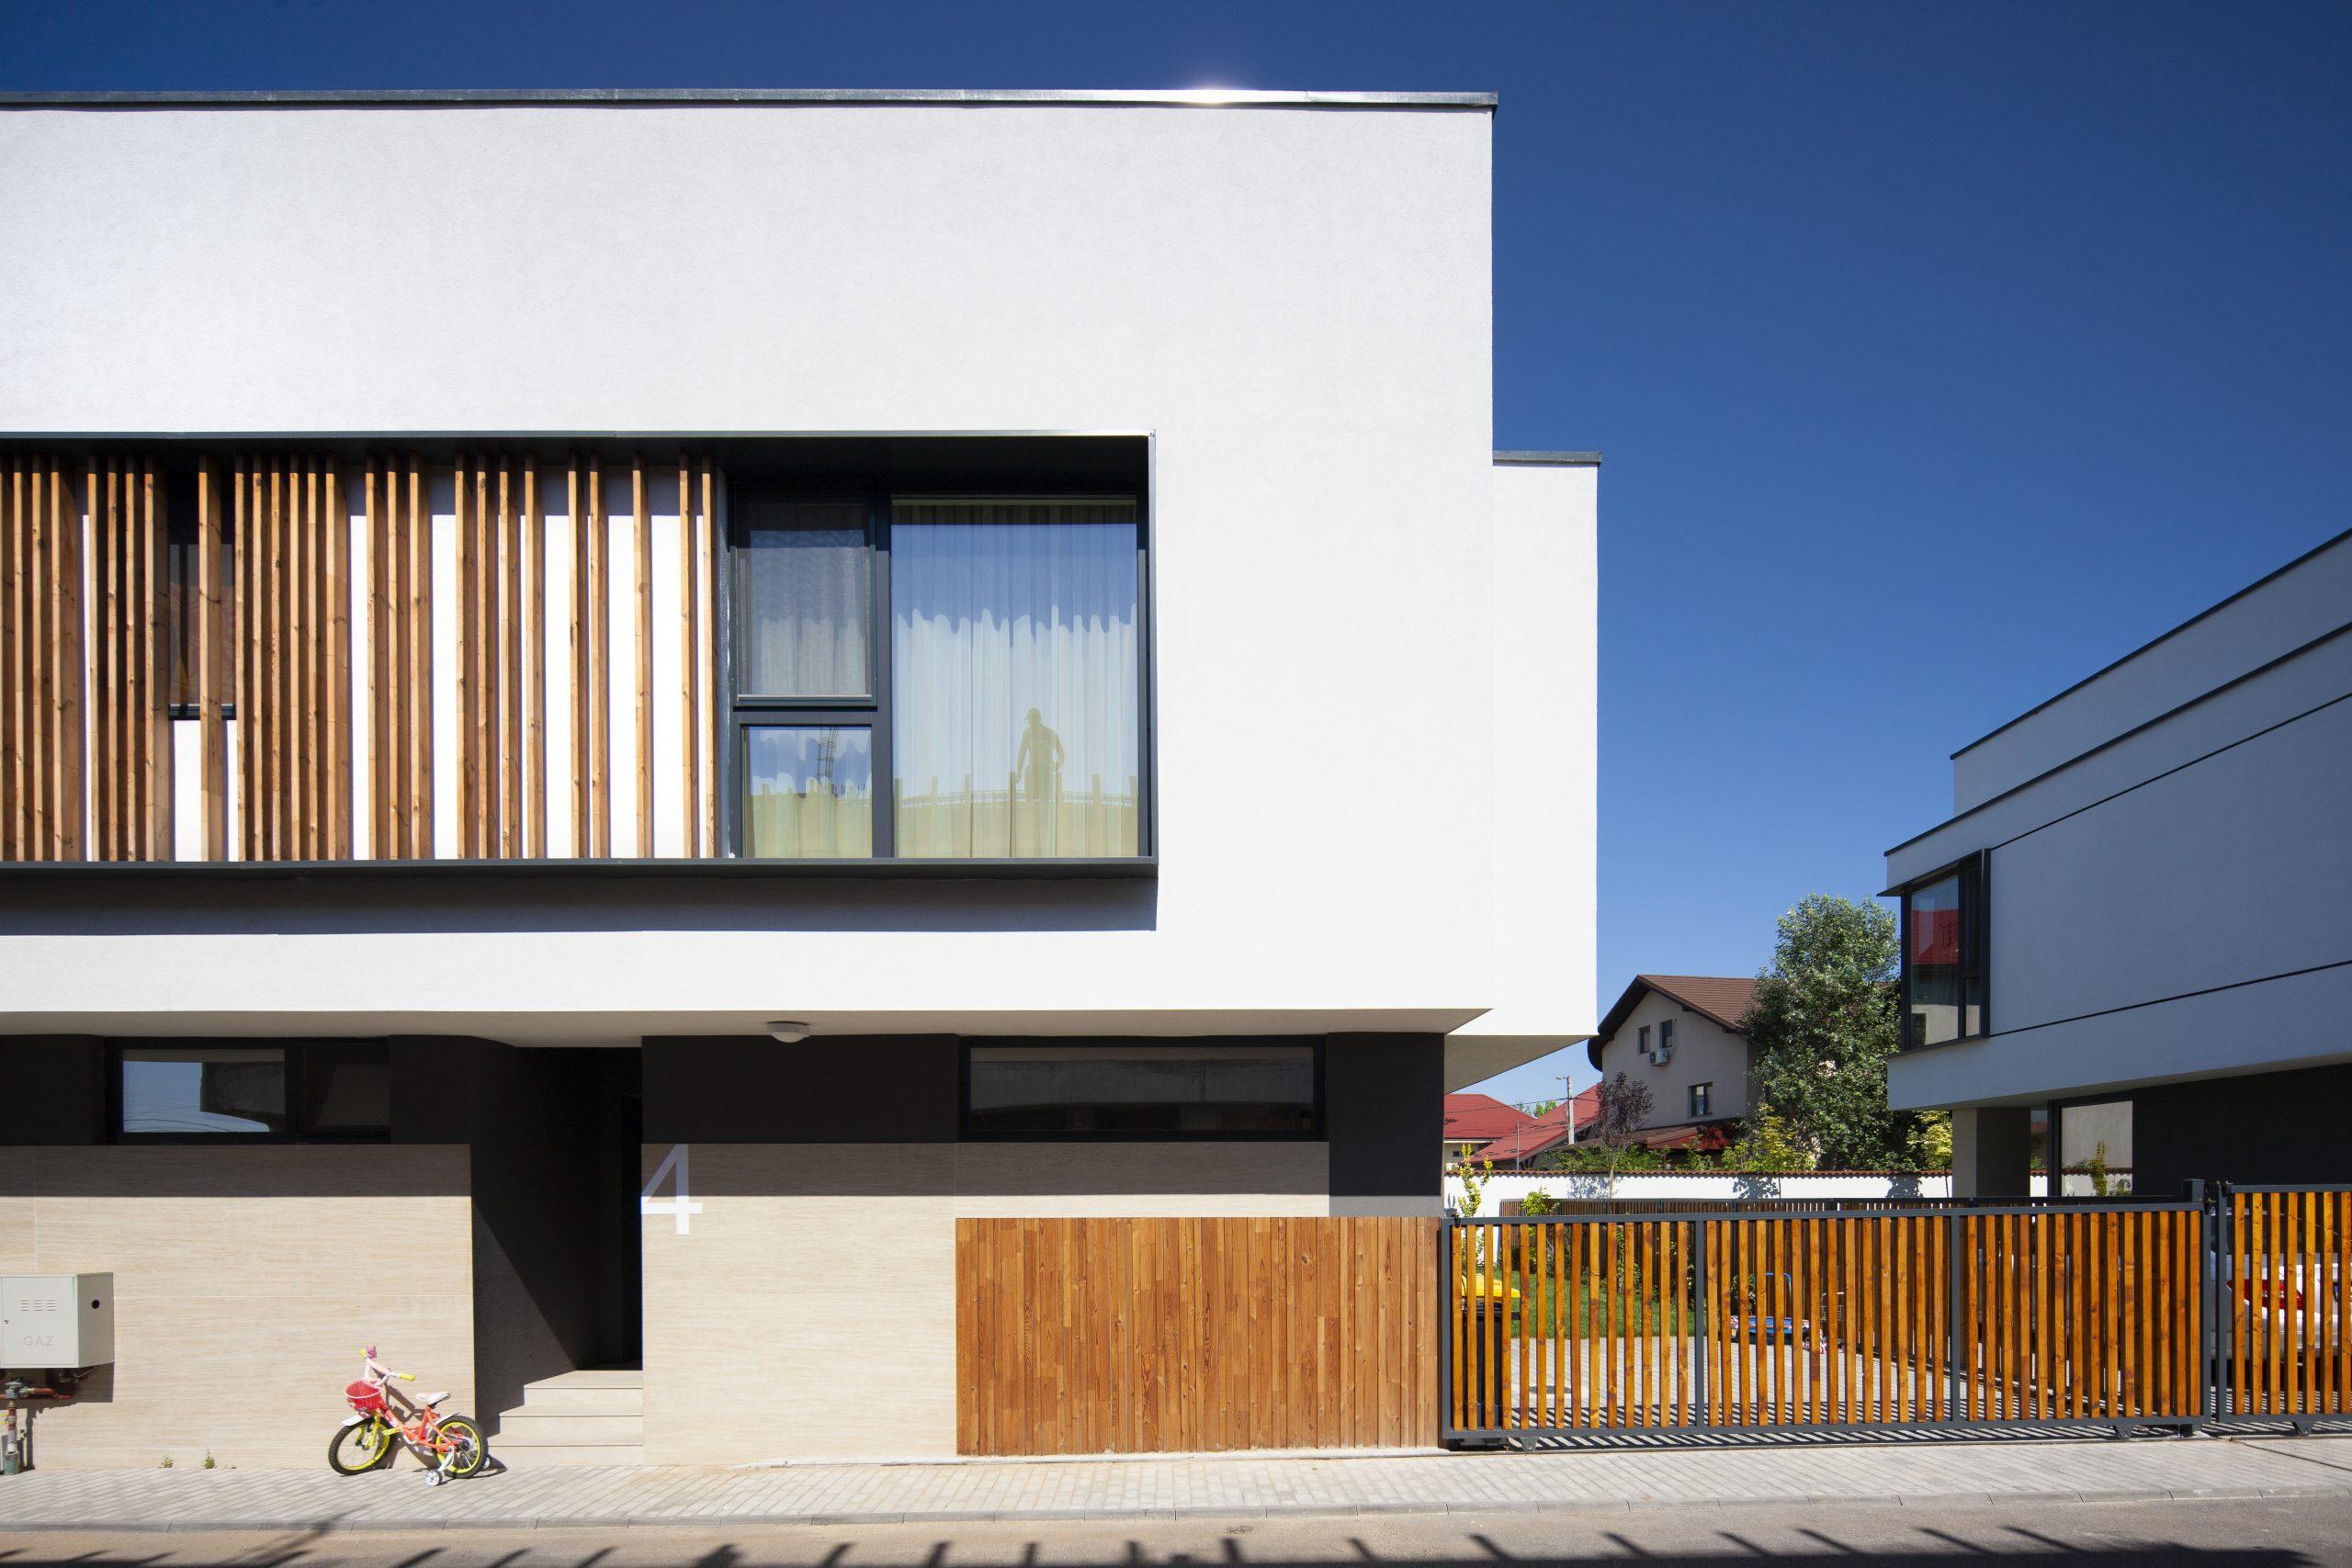 https://nbc-arhitect.ro/wp-content/uploads/2020/10/NBC-Arhitect-_-residentials-_-Contemporan-Residence-_-Bucharest-Romania_12-1-scaled.jpg